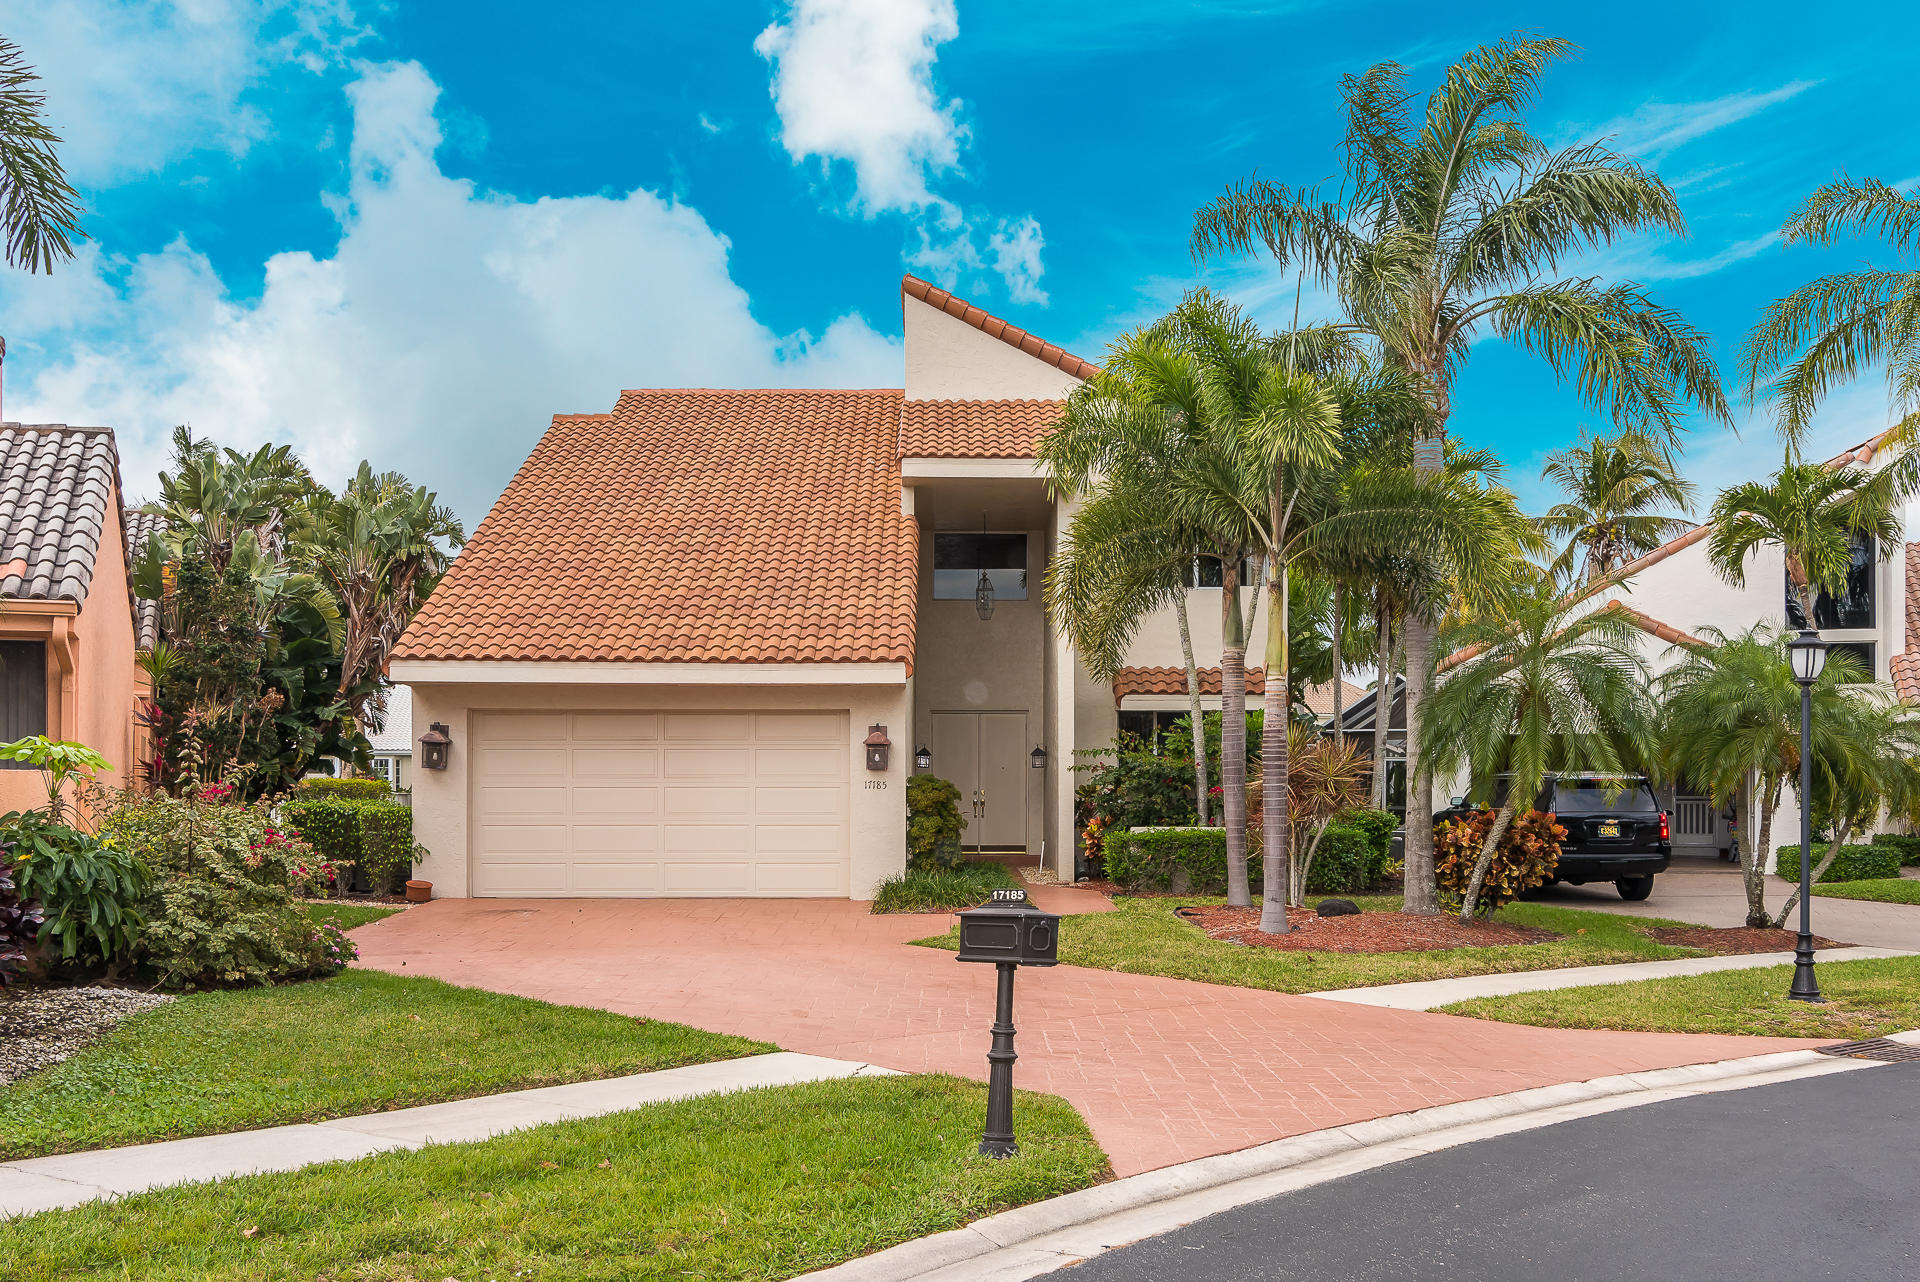 17185 Newport Club Drive Boca Raton, FL 33496